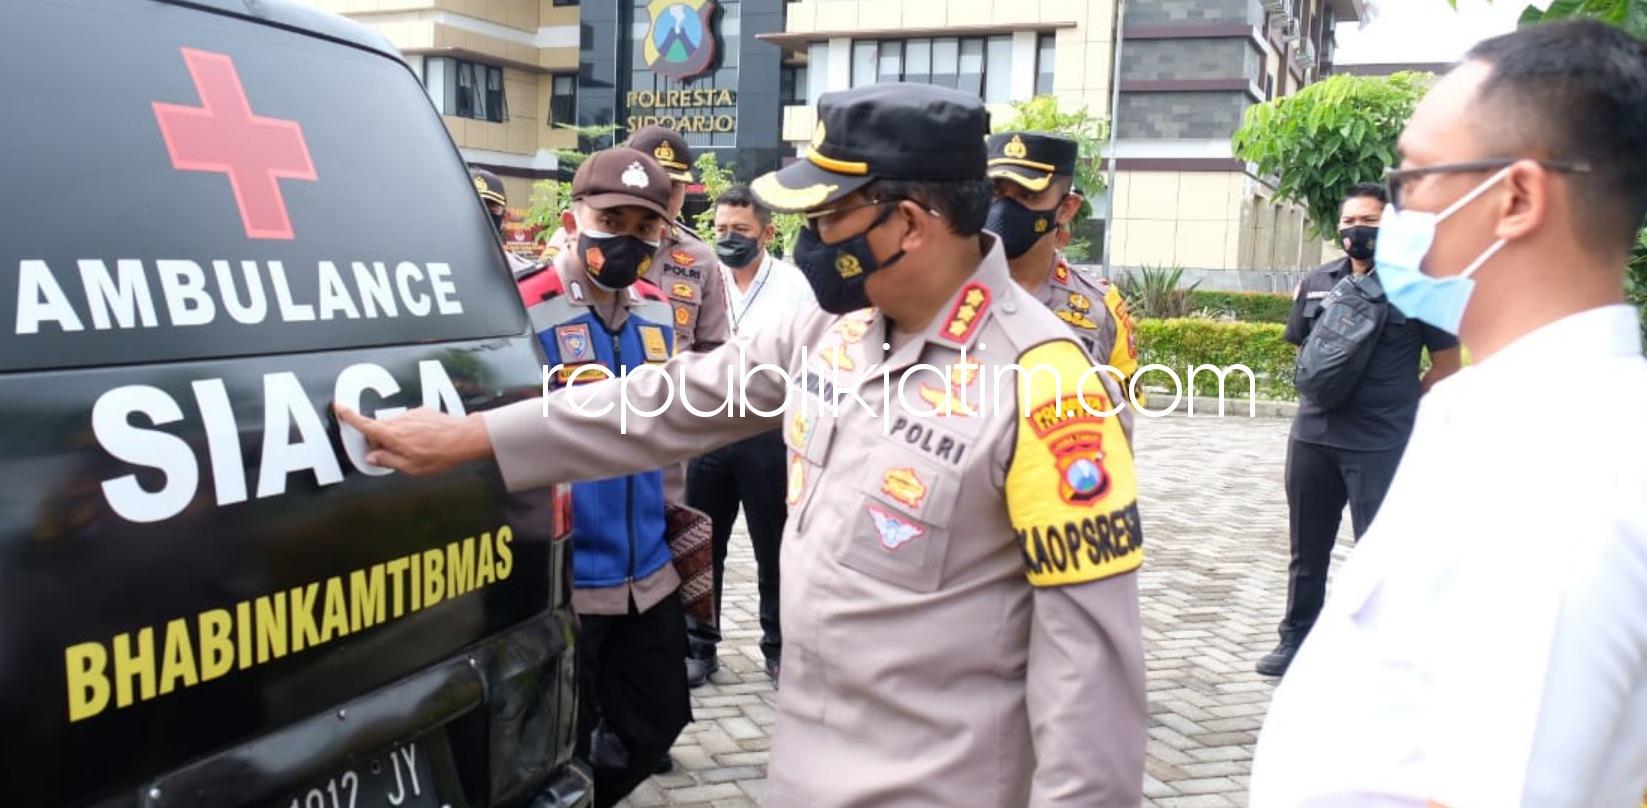 Kapolresta Sidoarjo Apresiasi Bhabinkamtibmas Sulap Mobil Pribadi Jadi Ambulan Layani Pasien Covid-19